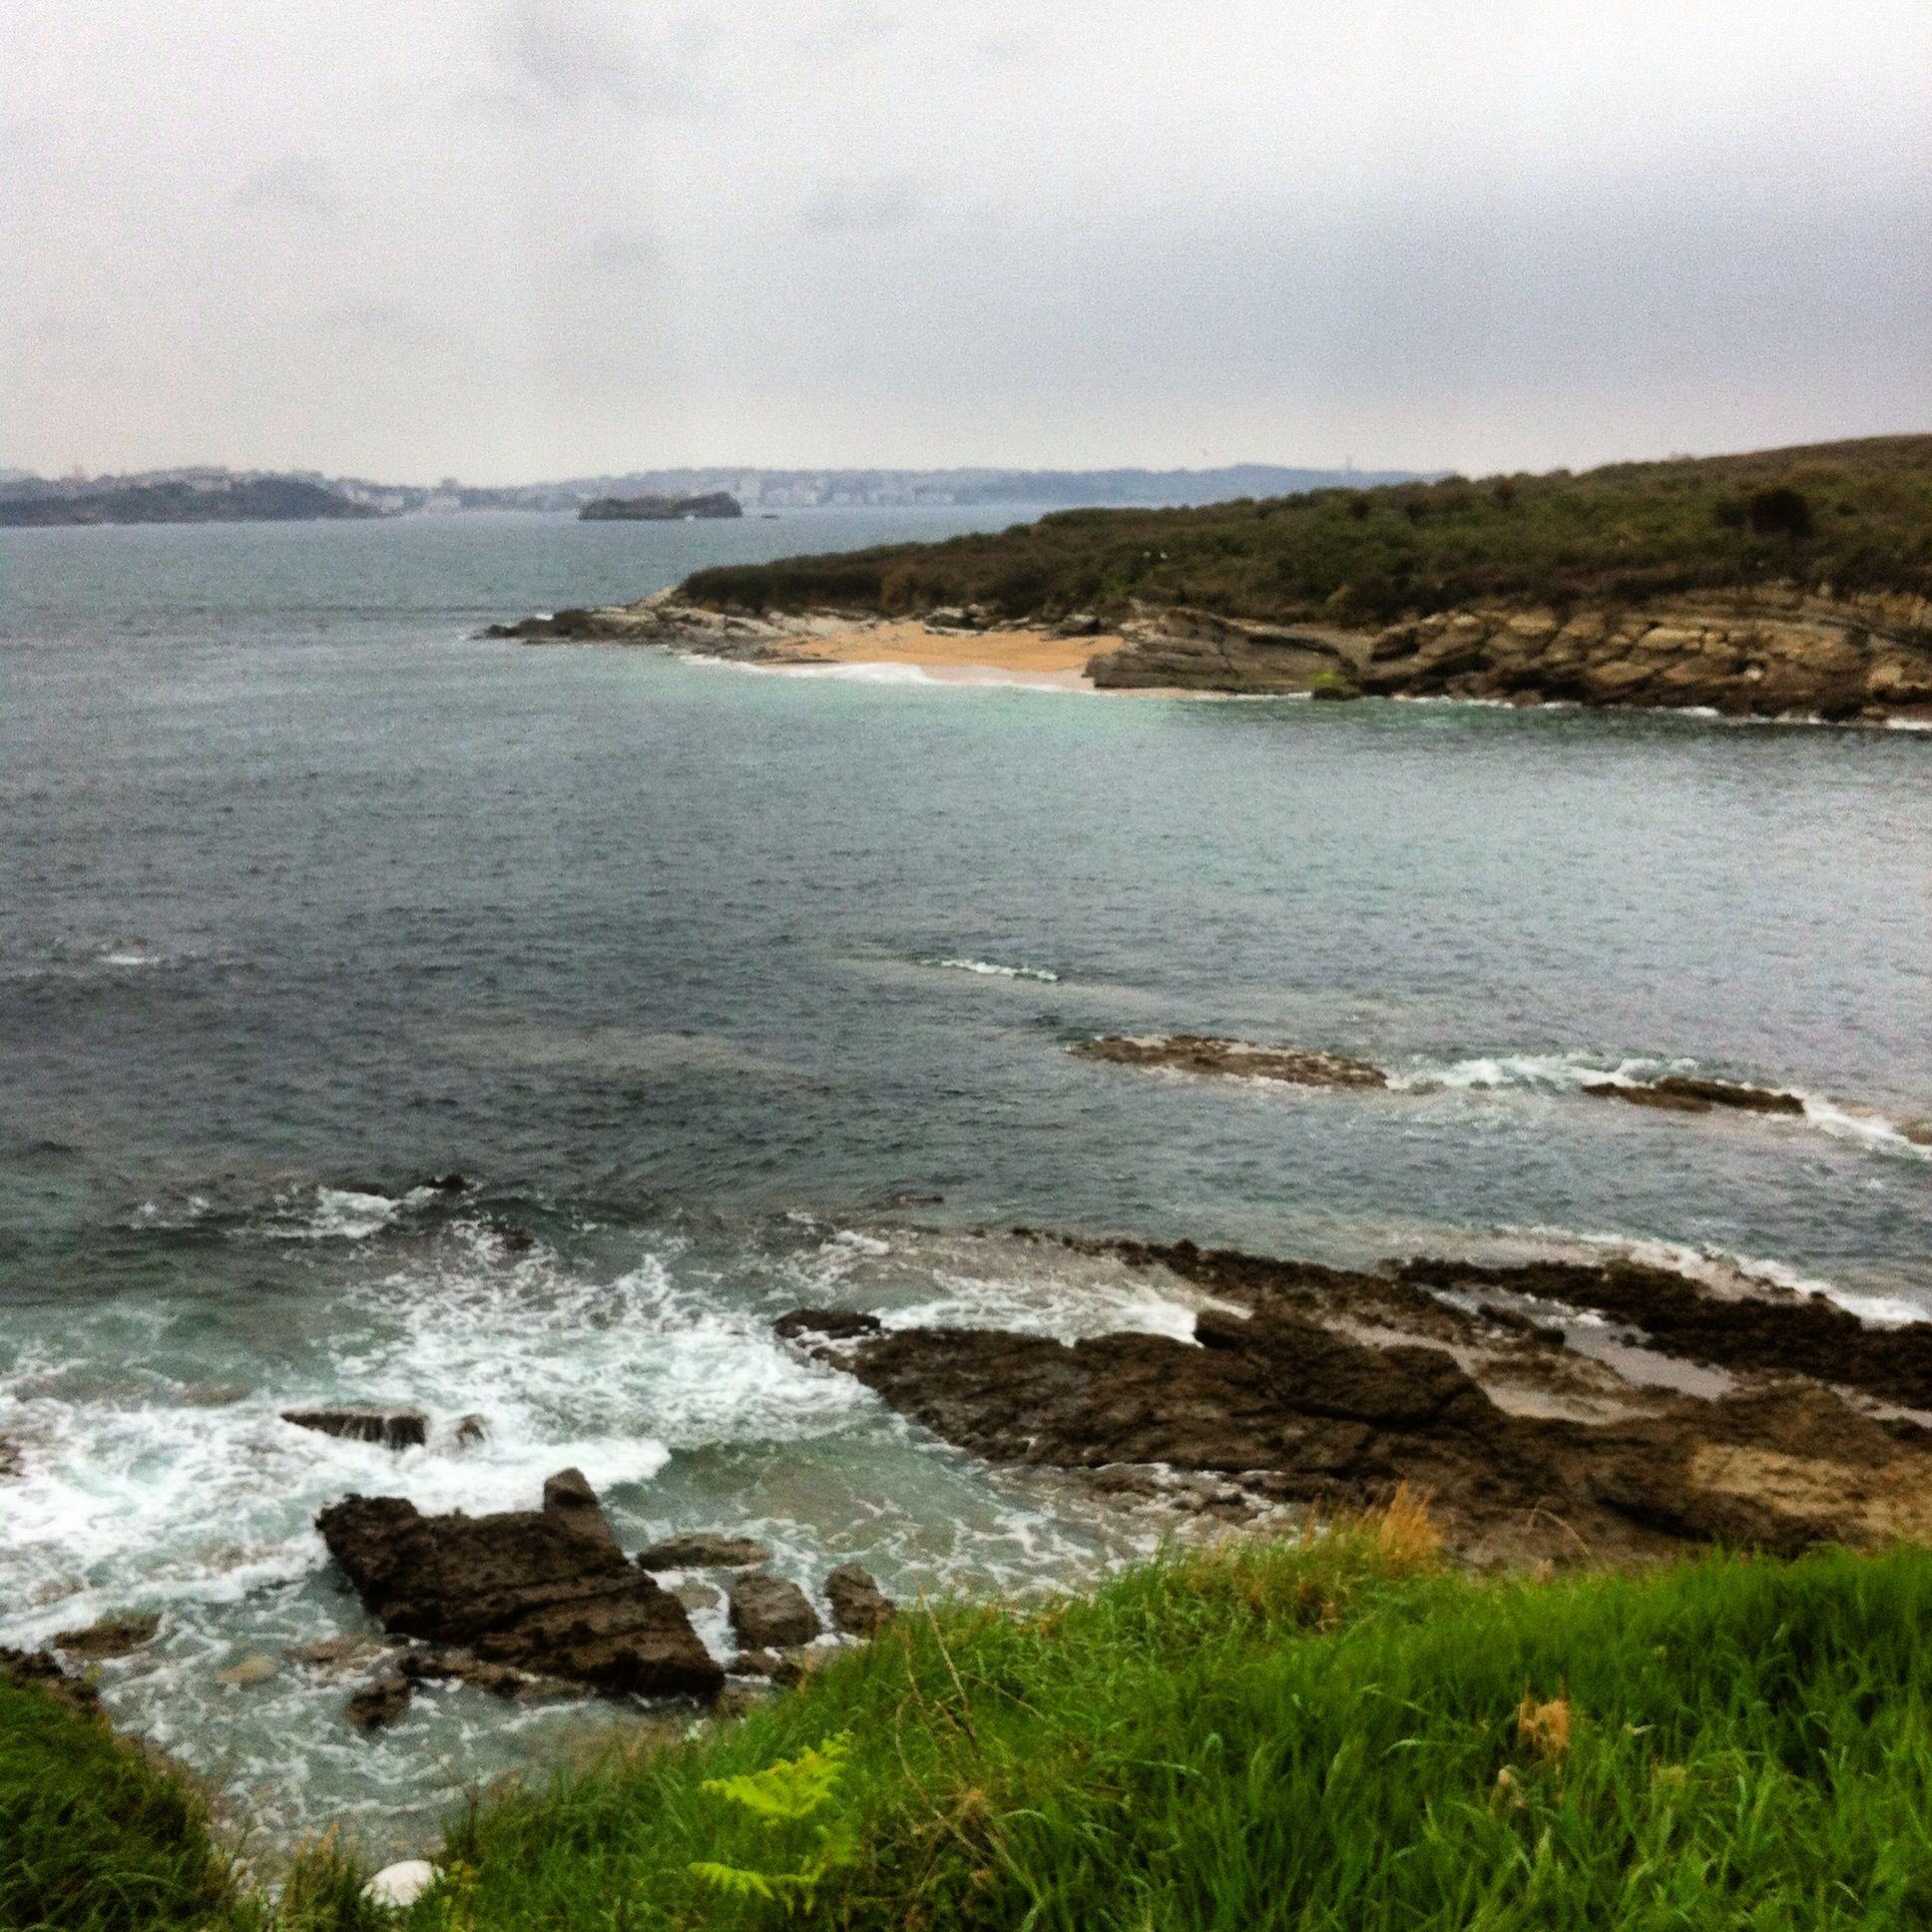 Vista de la Isla desde Loredo.